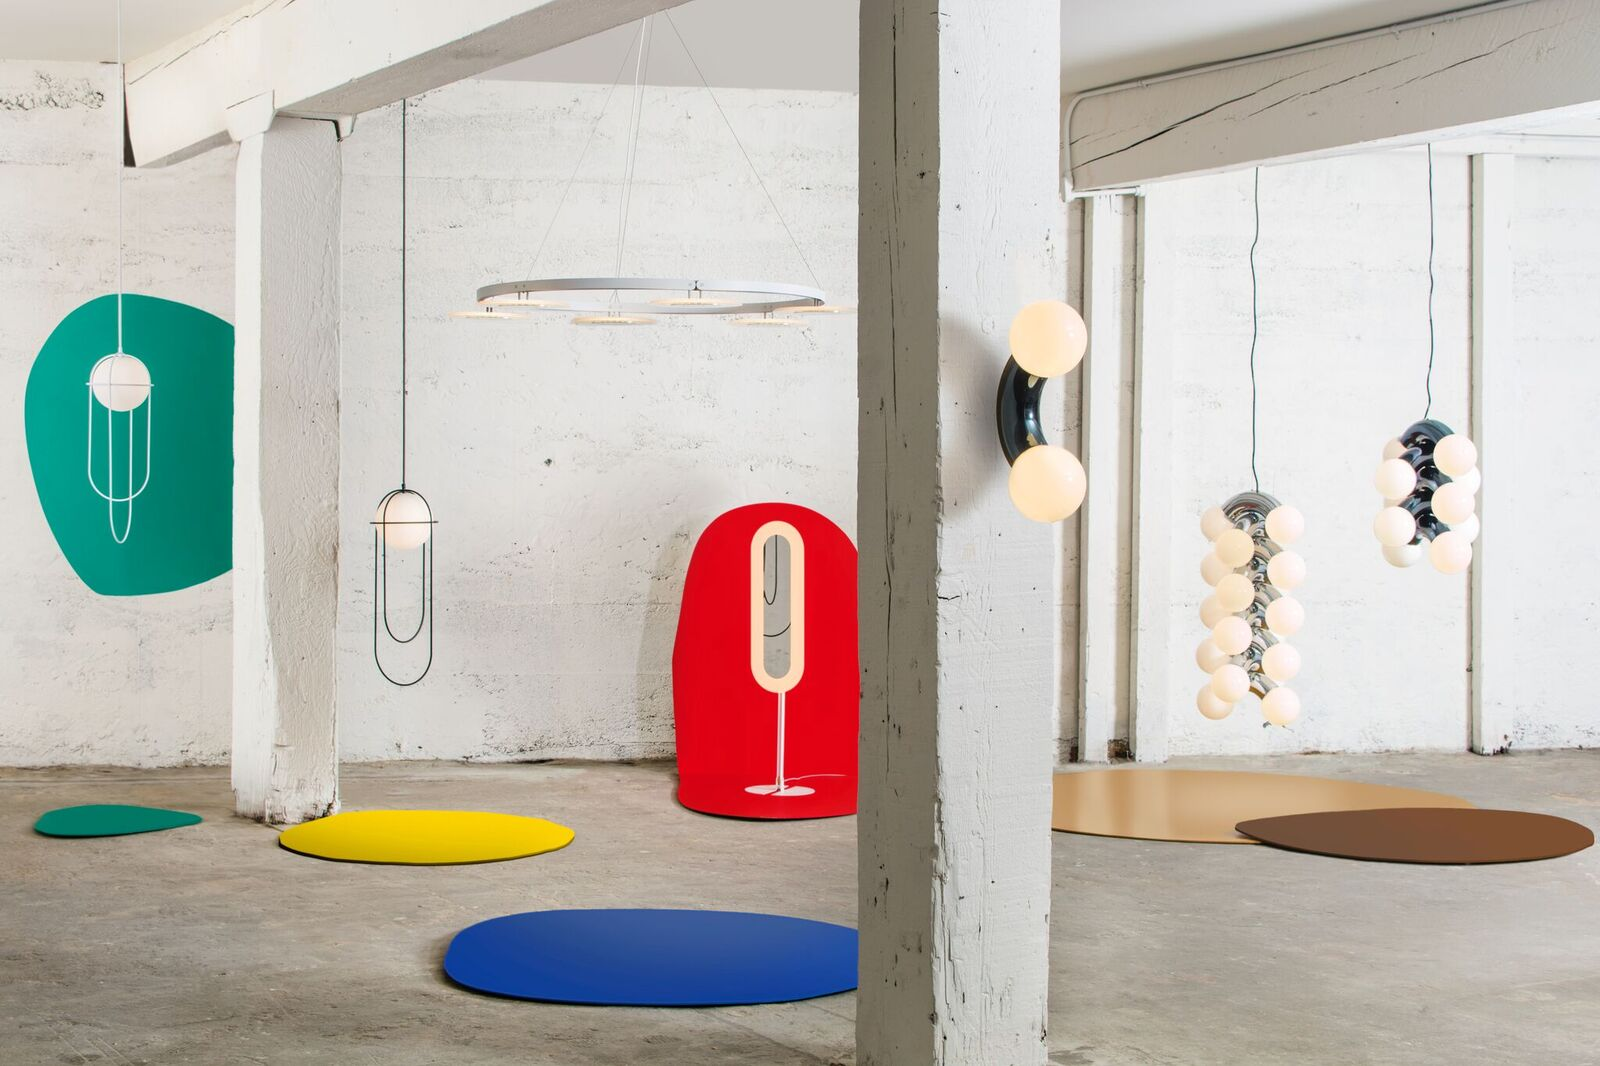 ANDlight at designjunction for interior design events blog